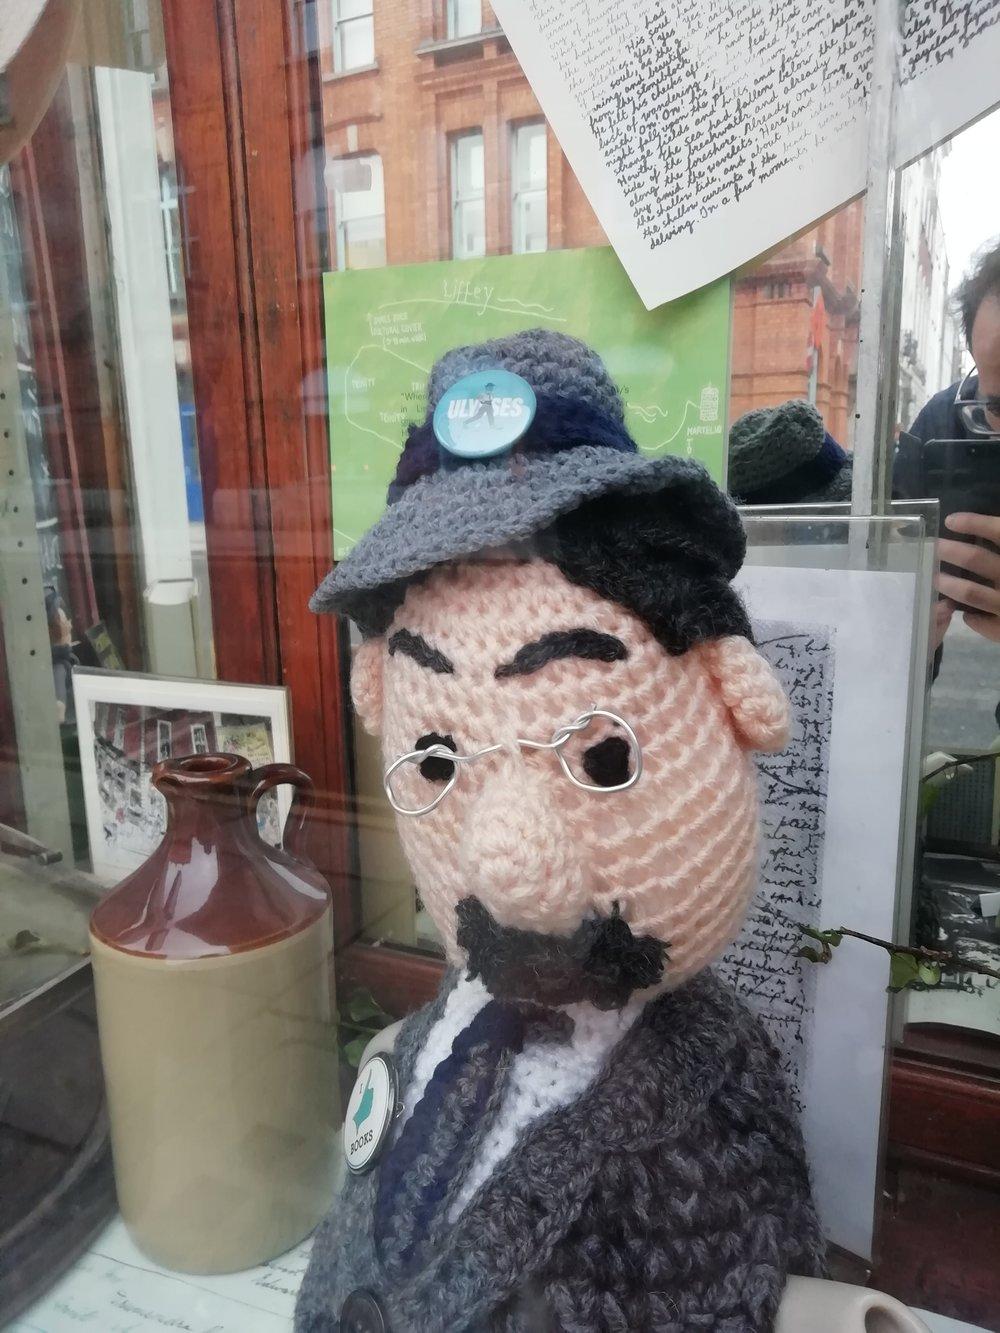 Ulysses badge in Sweny's Pharmacy Window